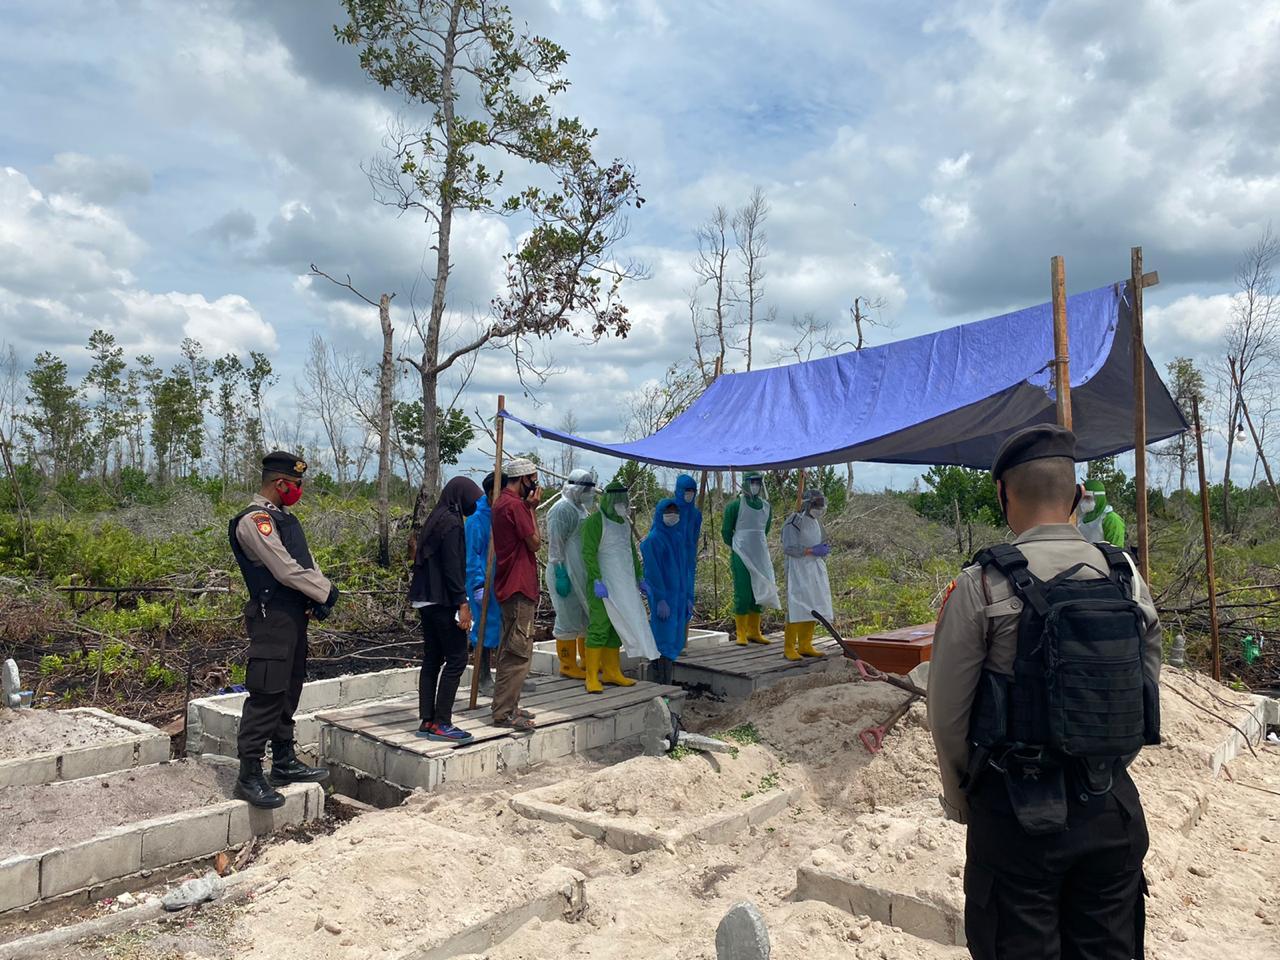 Tim URC Gugus Tugas Palangka Raya, Kawal Proses Pemakaman Suspek Covid-19 Di TPU Km.12